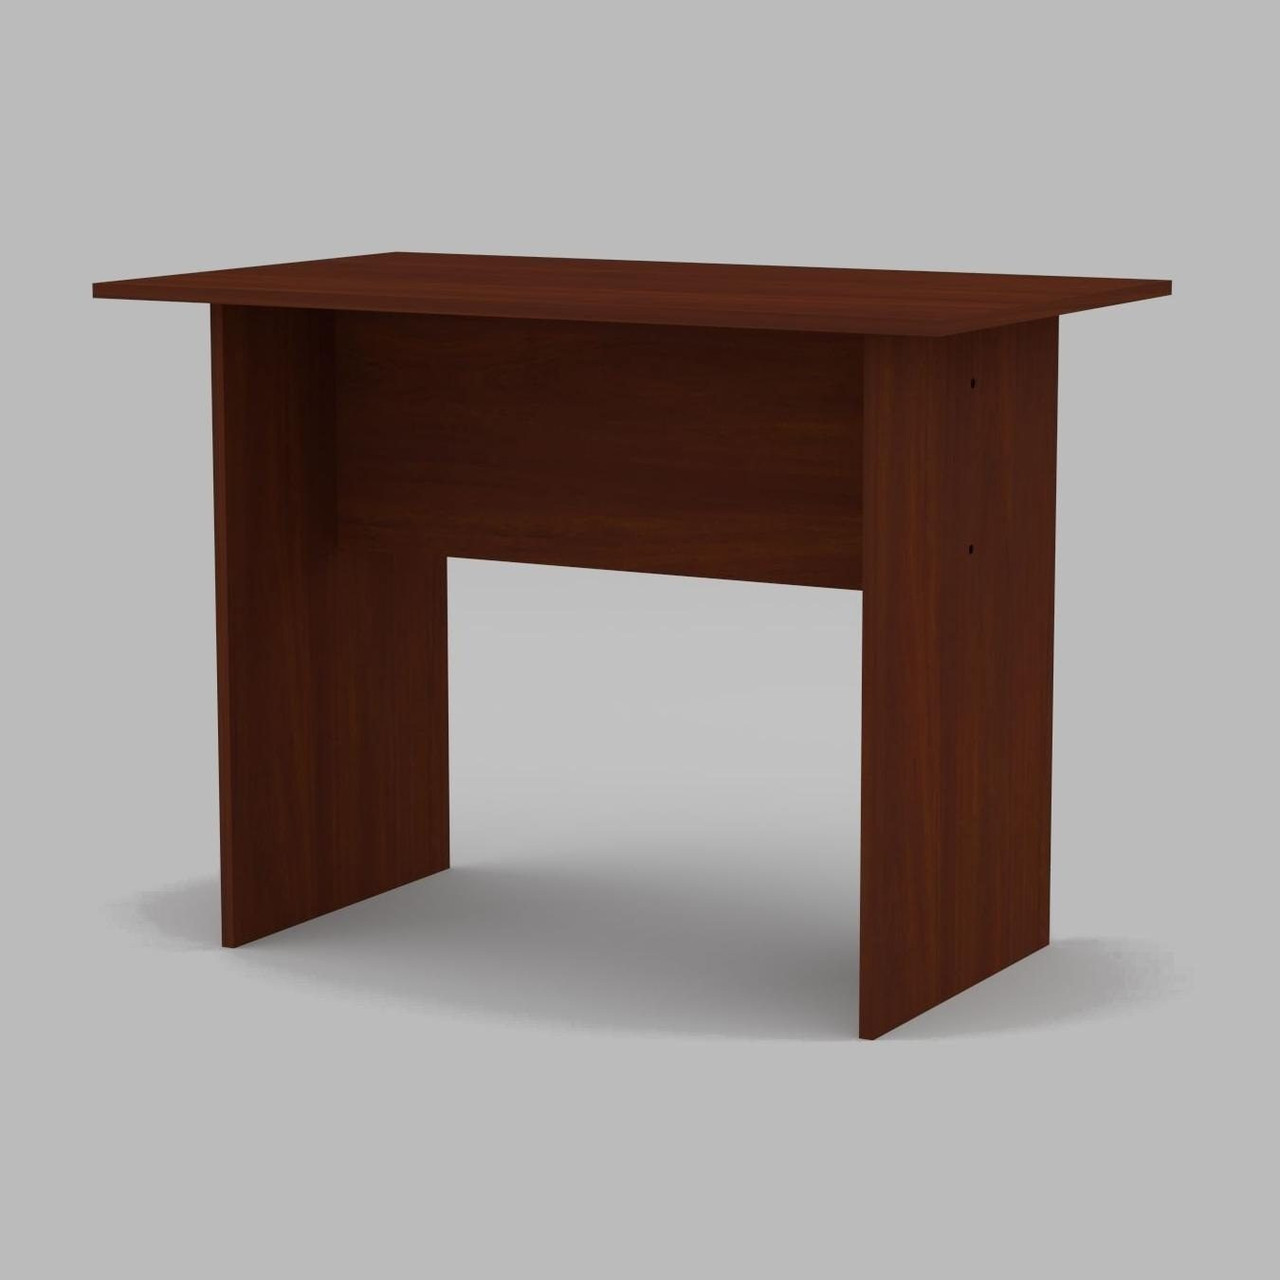 Письменный стол Компанит МО-1 1000х600х736 мм яблоня